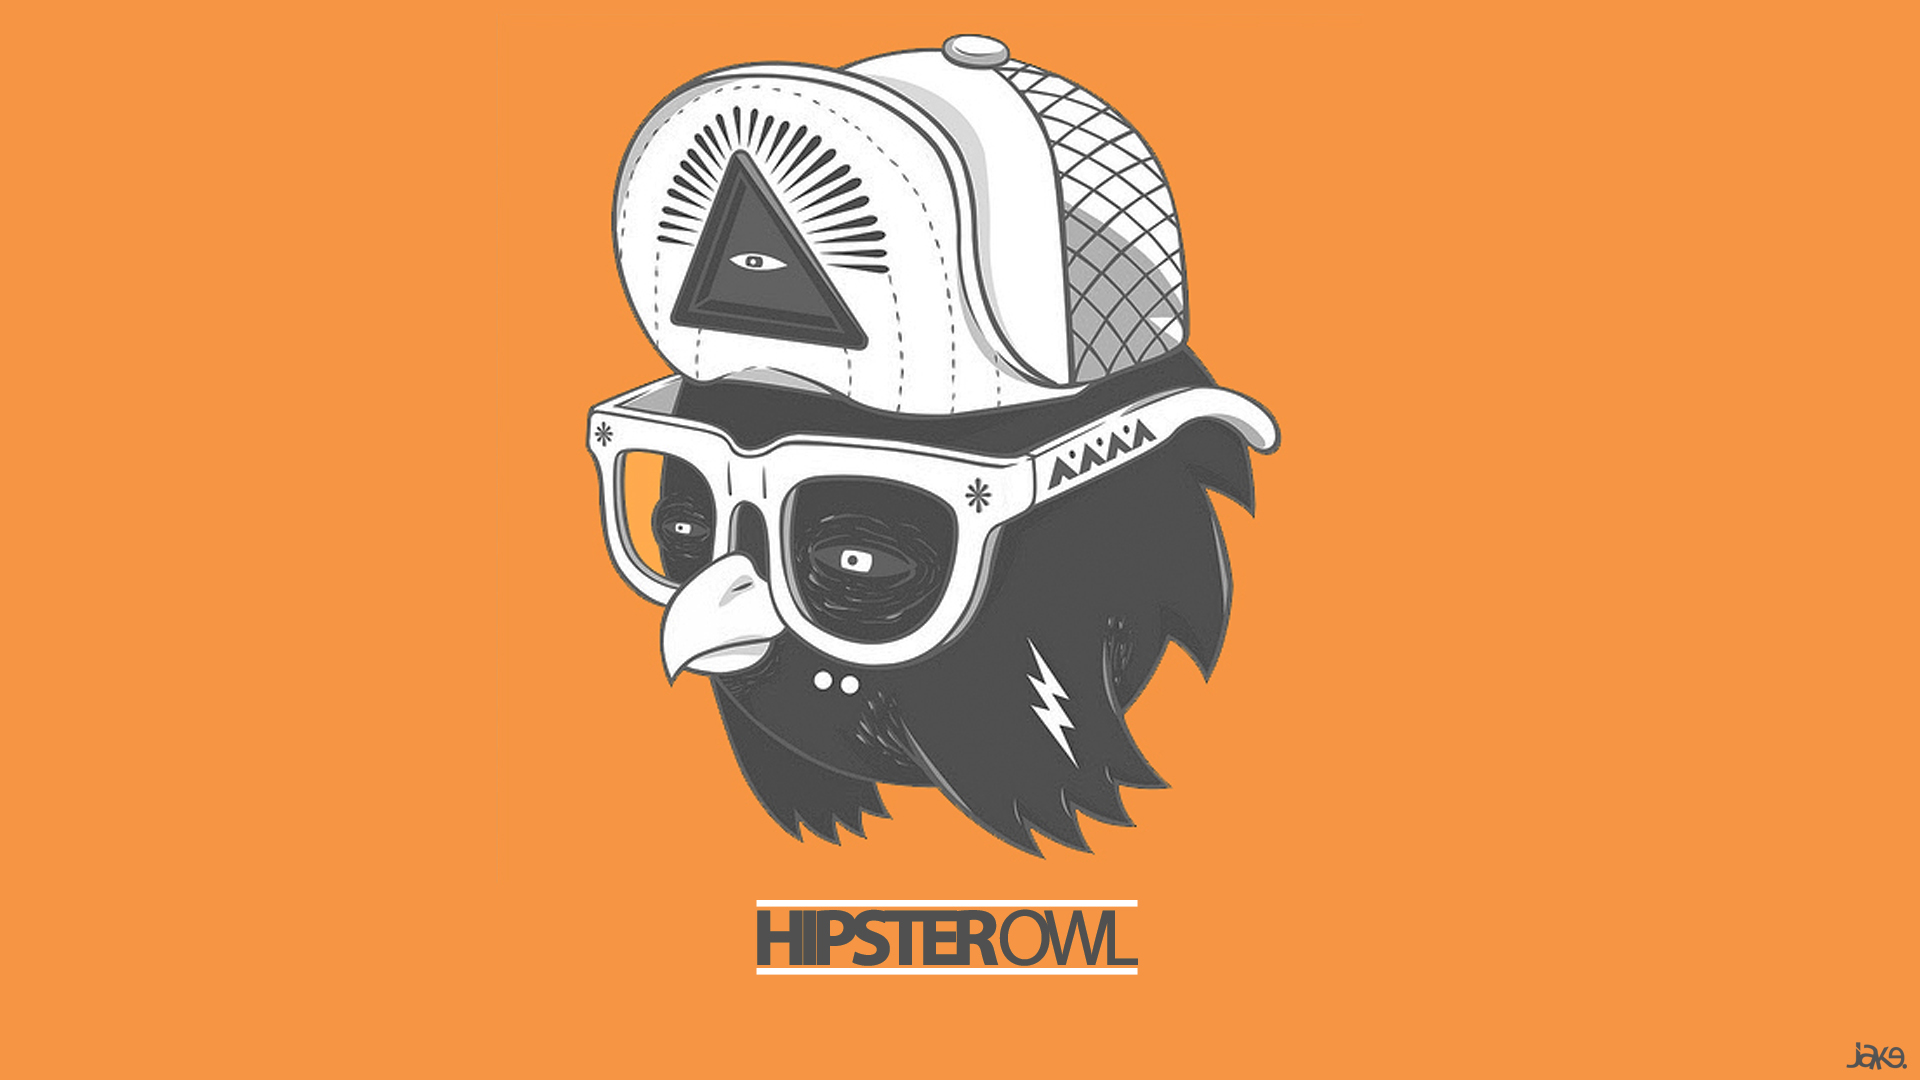 Hipster Owl wallpaper - 989676